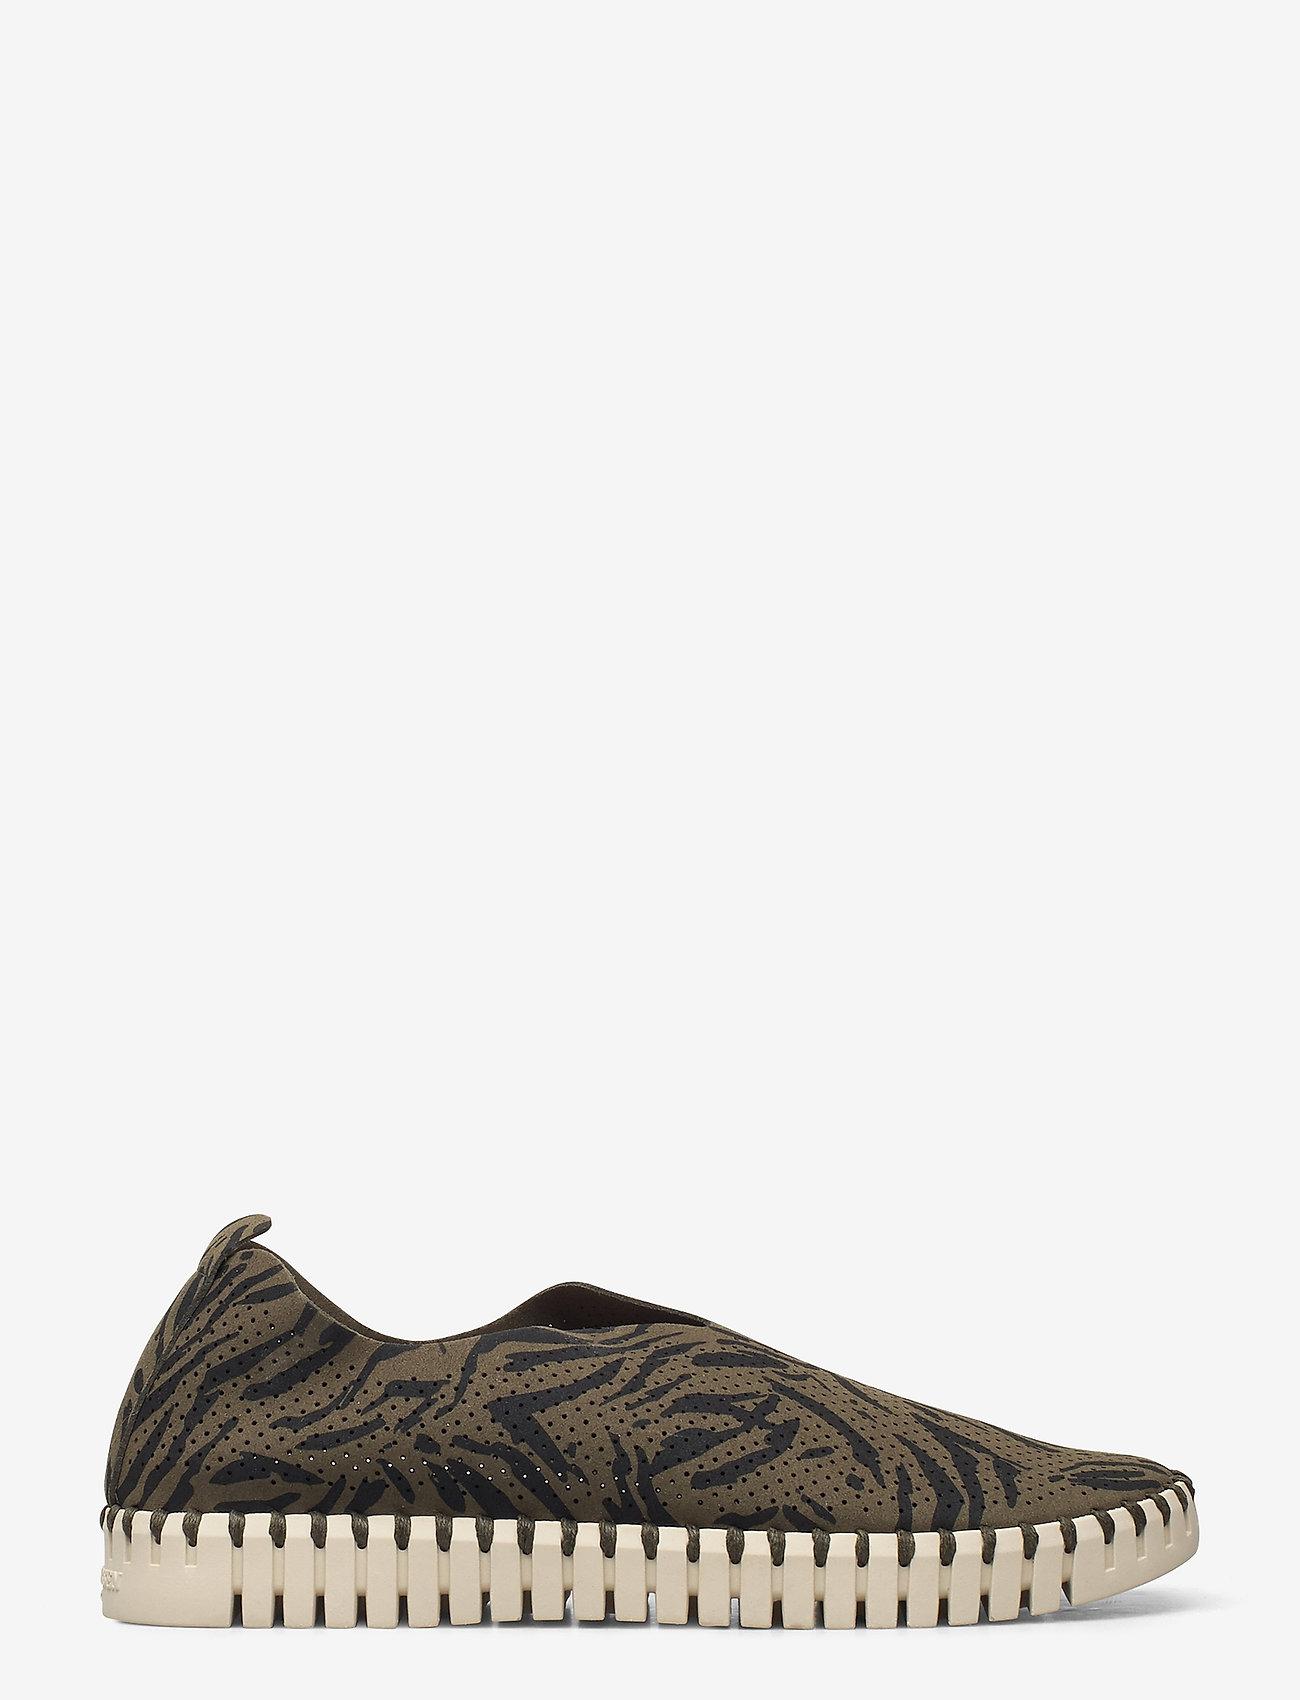 Ilse Jacobsen - FLATS - baskets slip-on - deep olive - 1